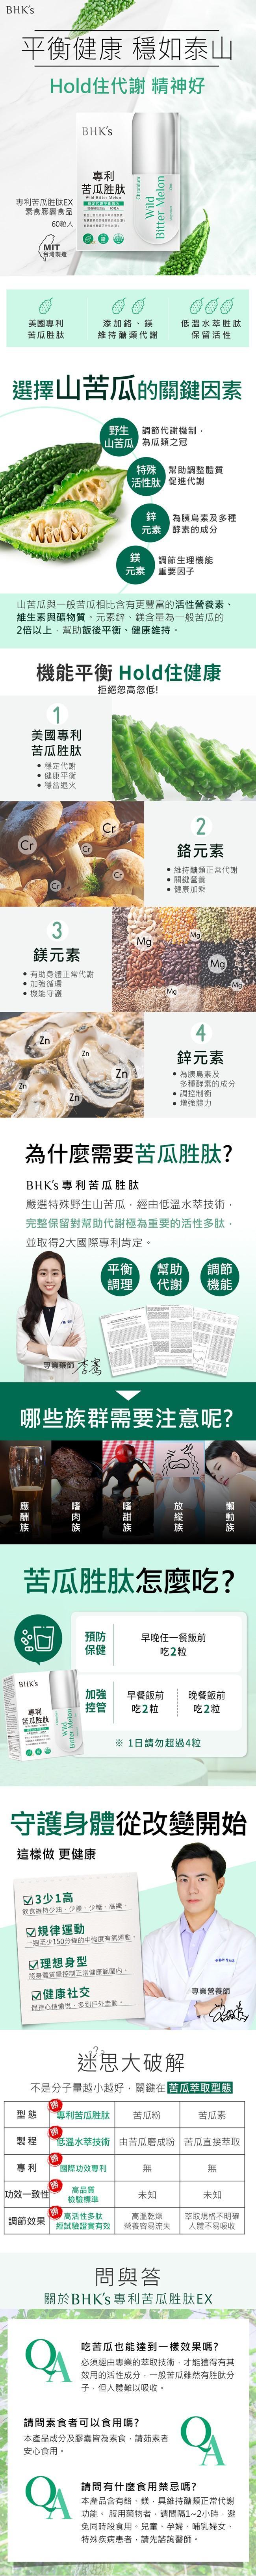 BHK's-專利苦瓜胜肽EX素食膠囊(60粒/盒)2盒組產品資訊